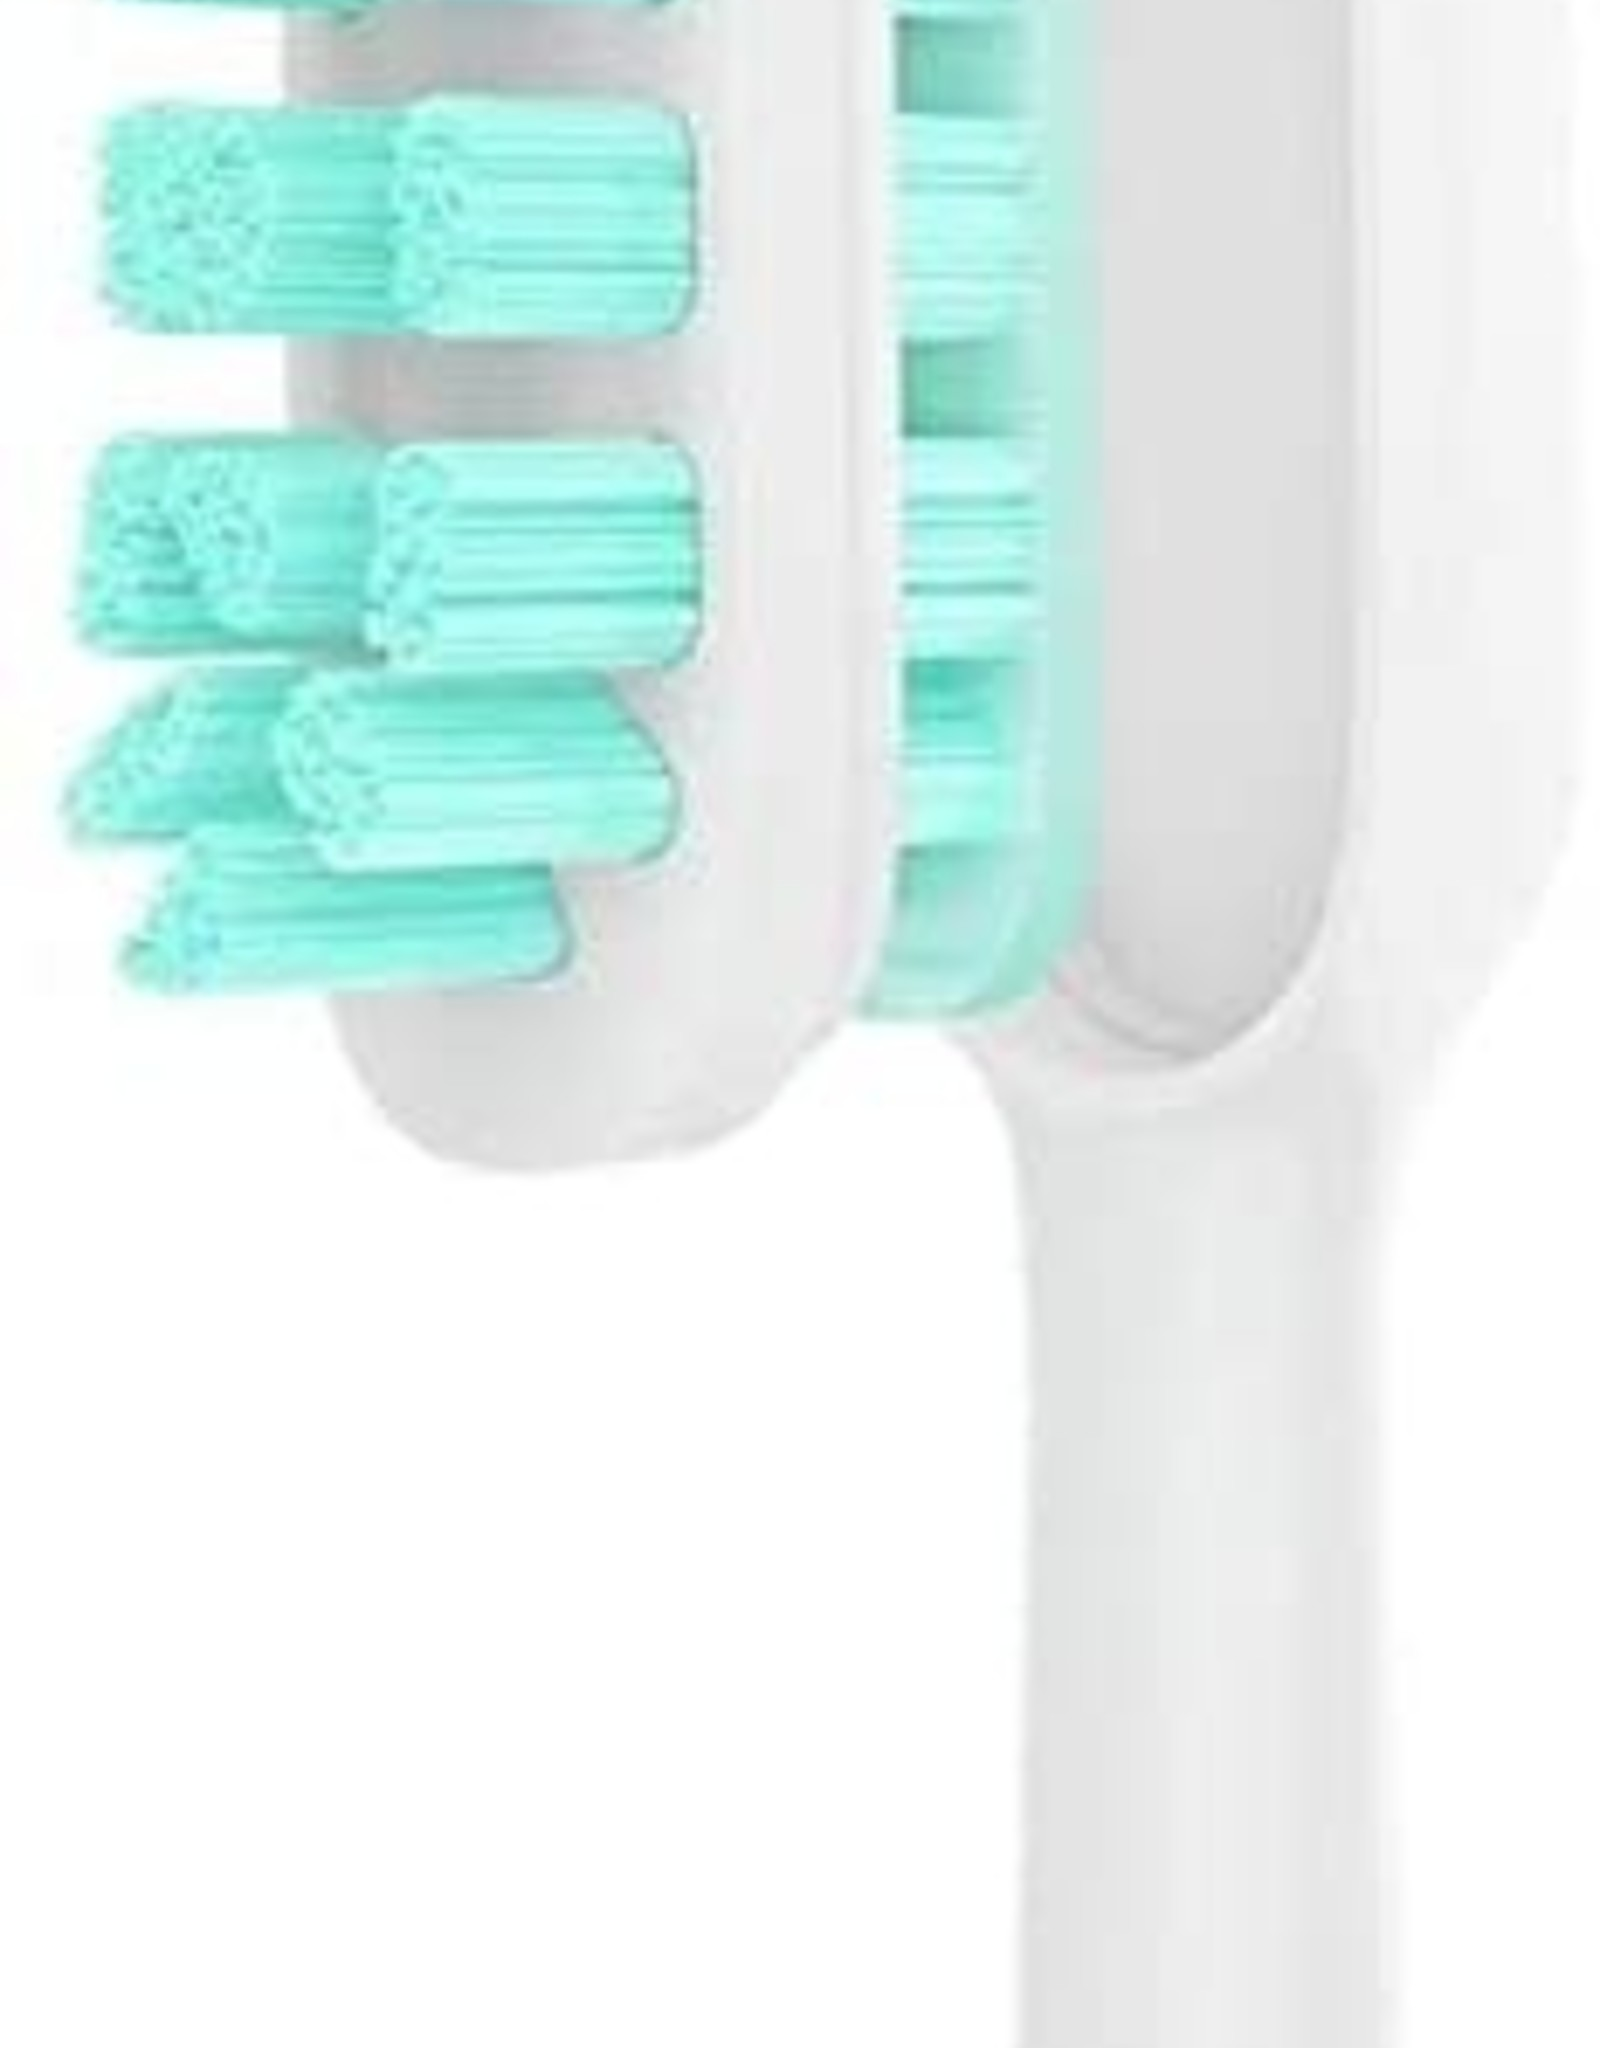 MI MI ToothBrush Head